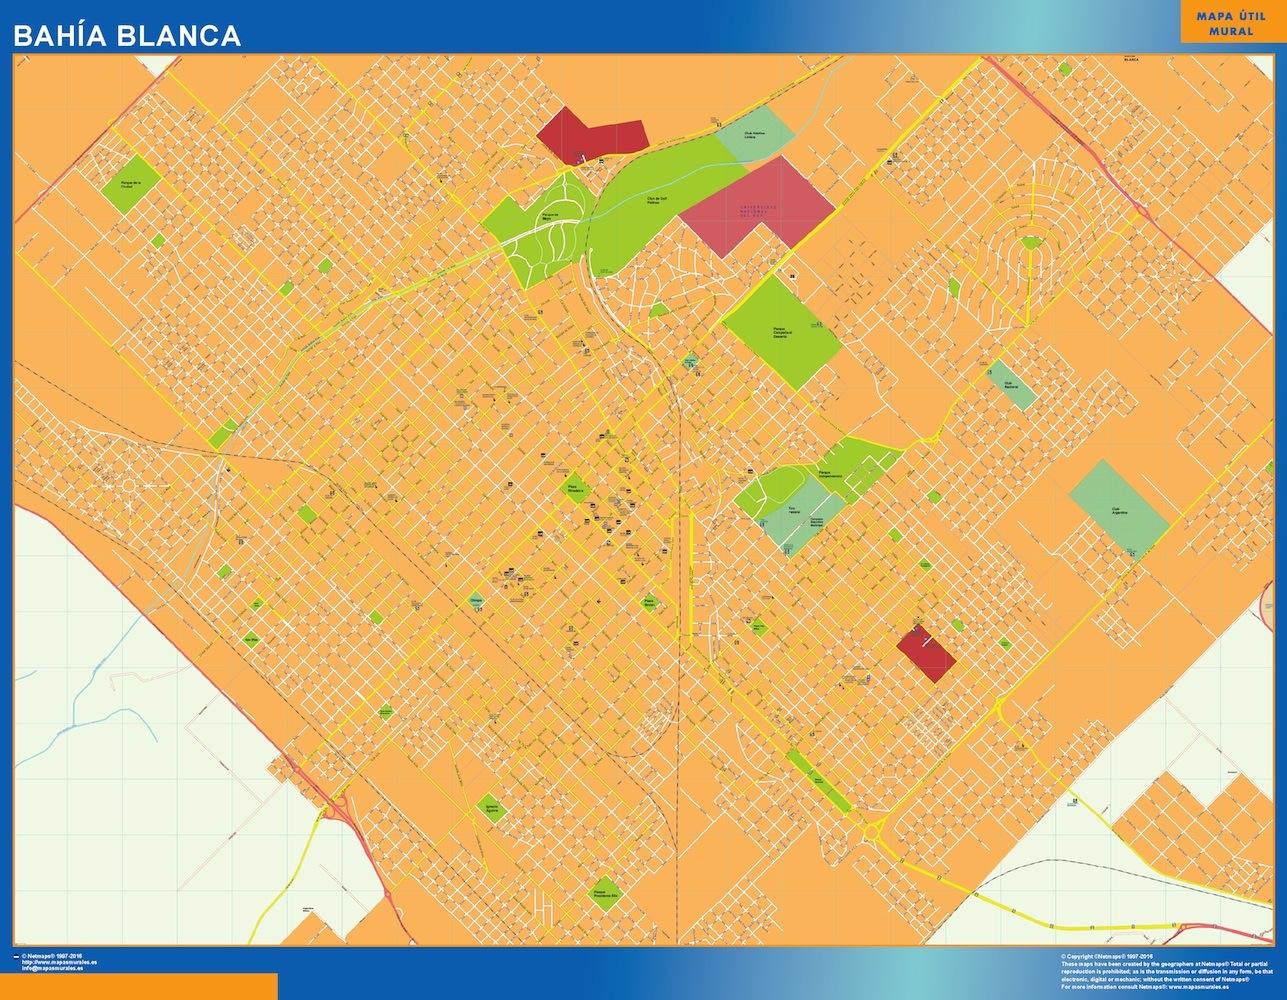 World Wall Maps Store Citymap Bahia Blanca Argentina Maps More - Argentina map bahia blanca